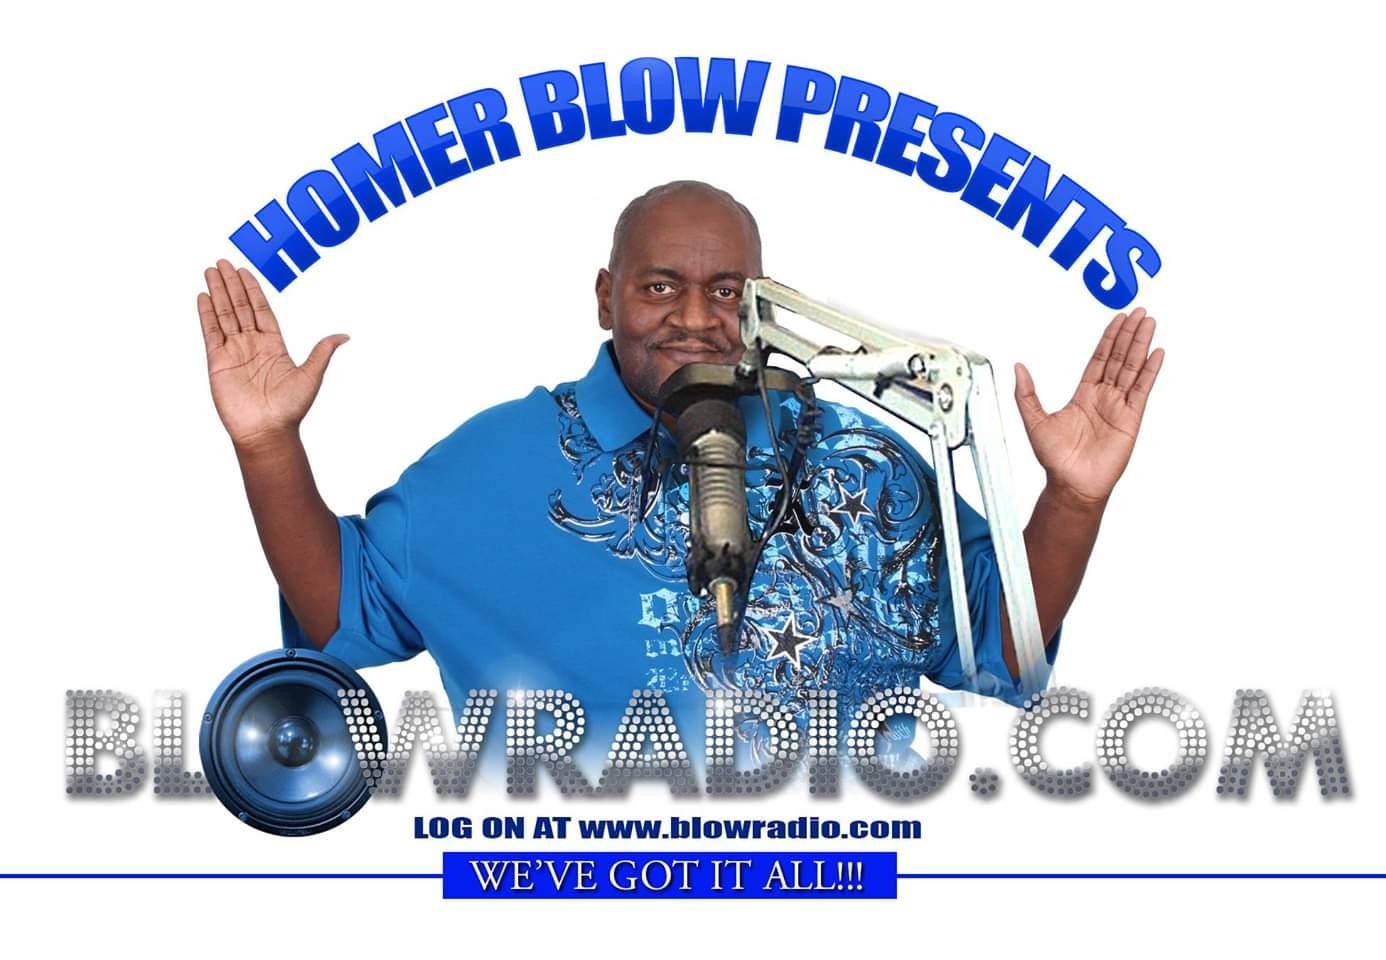 HOMER BLOW RADIO